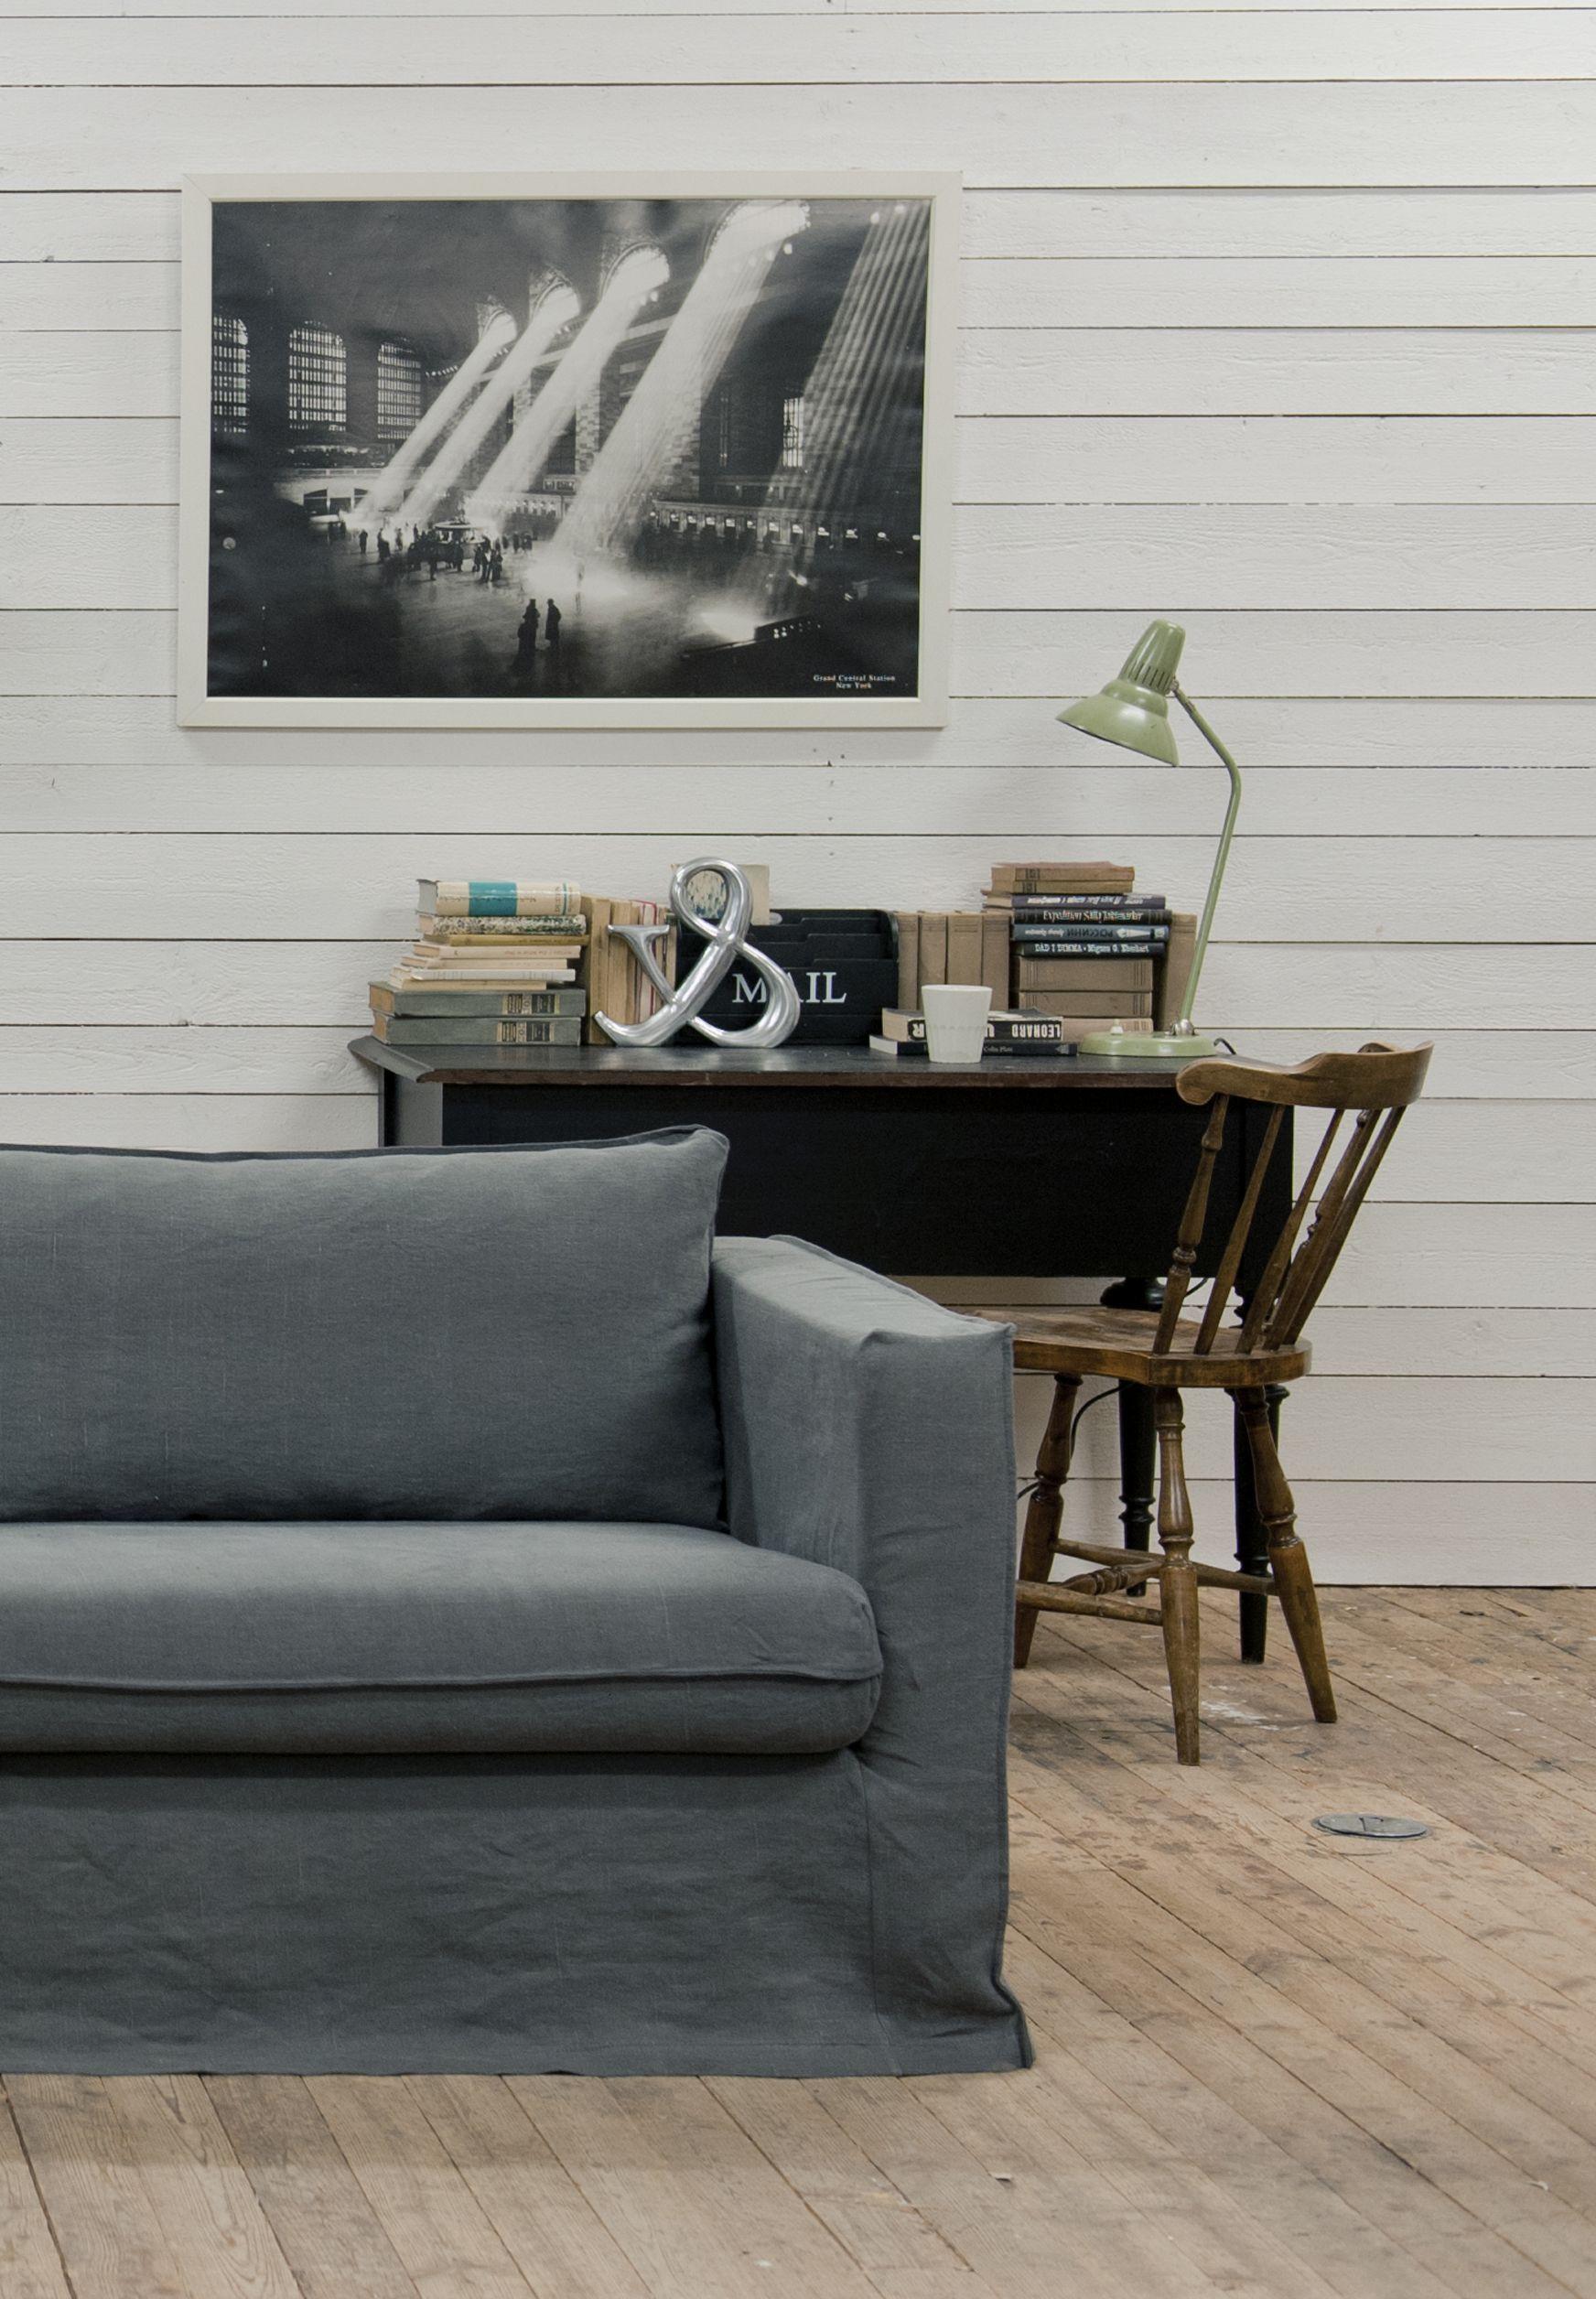 Urbanite Ikea Karlstad Sofa With A Medium Grey Rosendal Pure Washed Linen Cover By Bemz Www Bemz Com Sofa Covers Sofa Living Room Redo